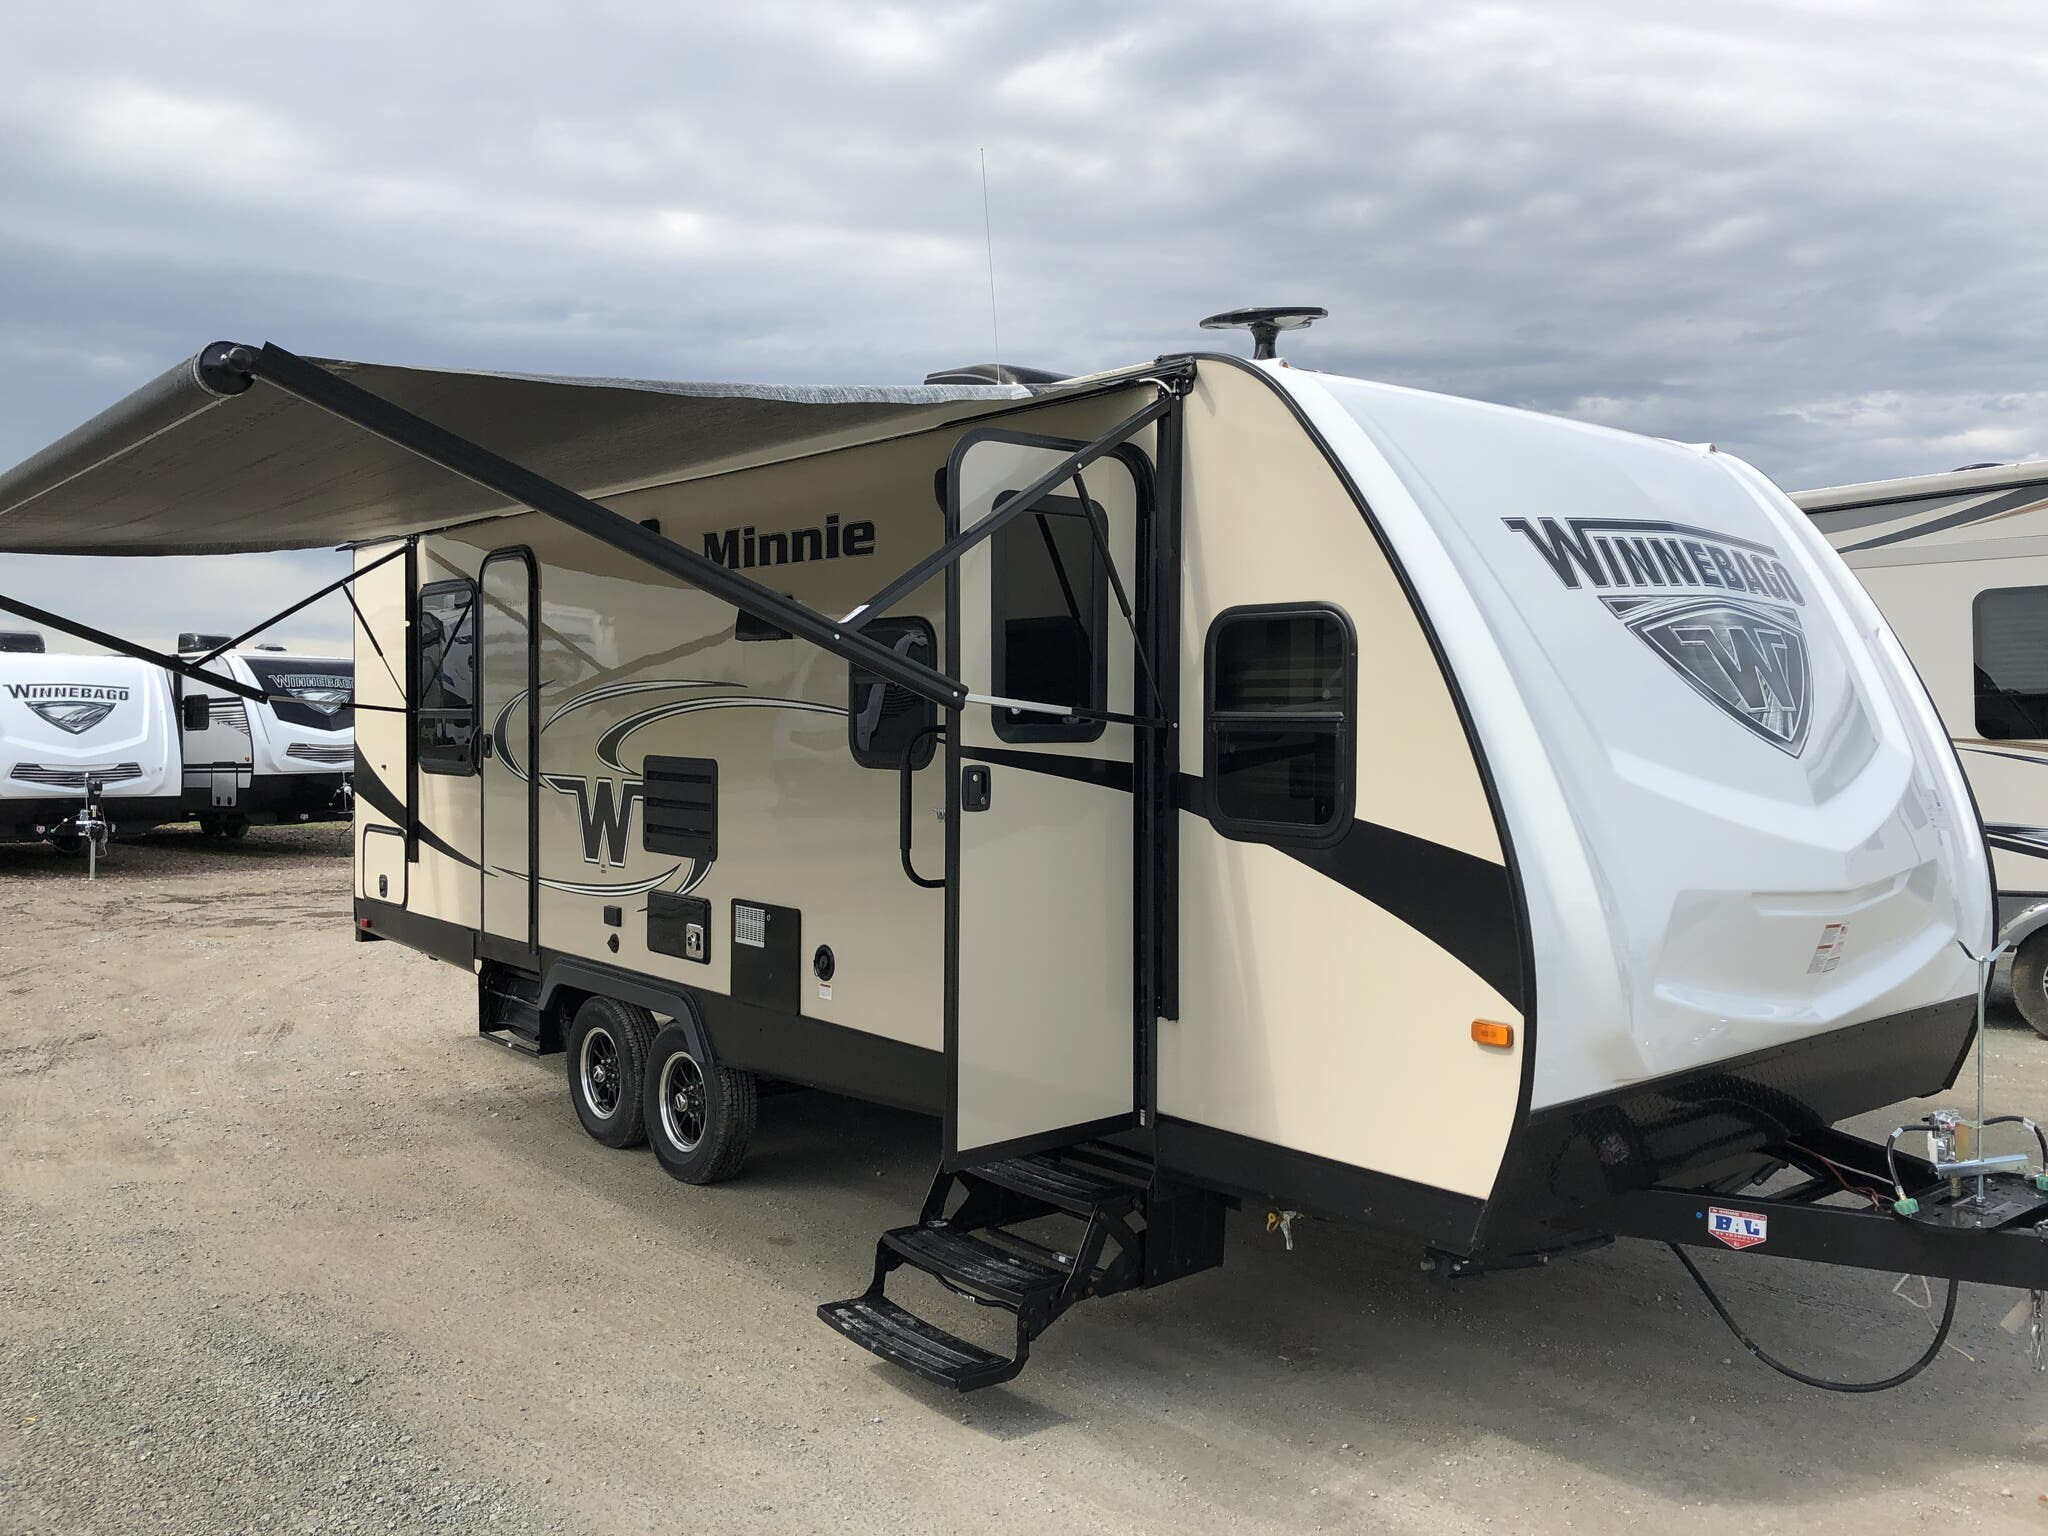 2019 Winnebago RV Minnie 2500FL for Sale in Bunker Hill, IN 46914 | B042156